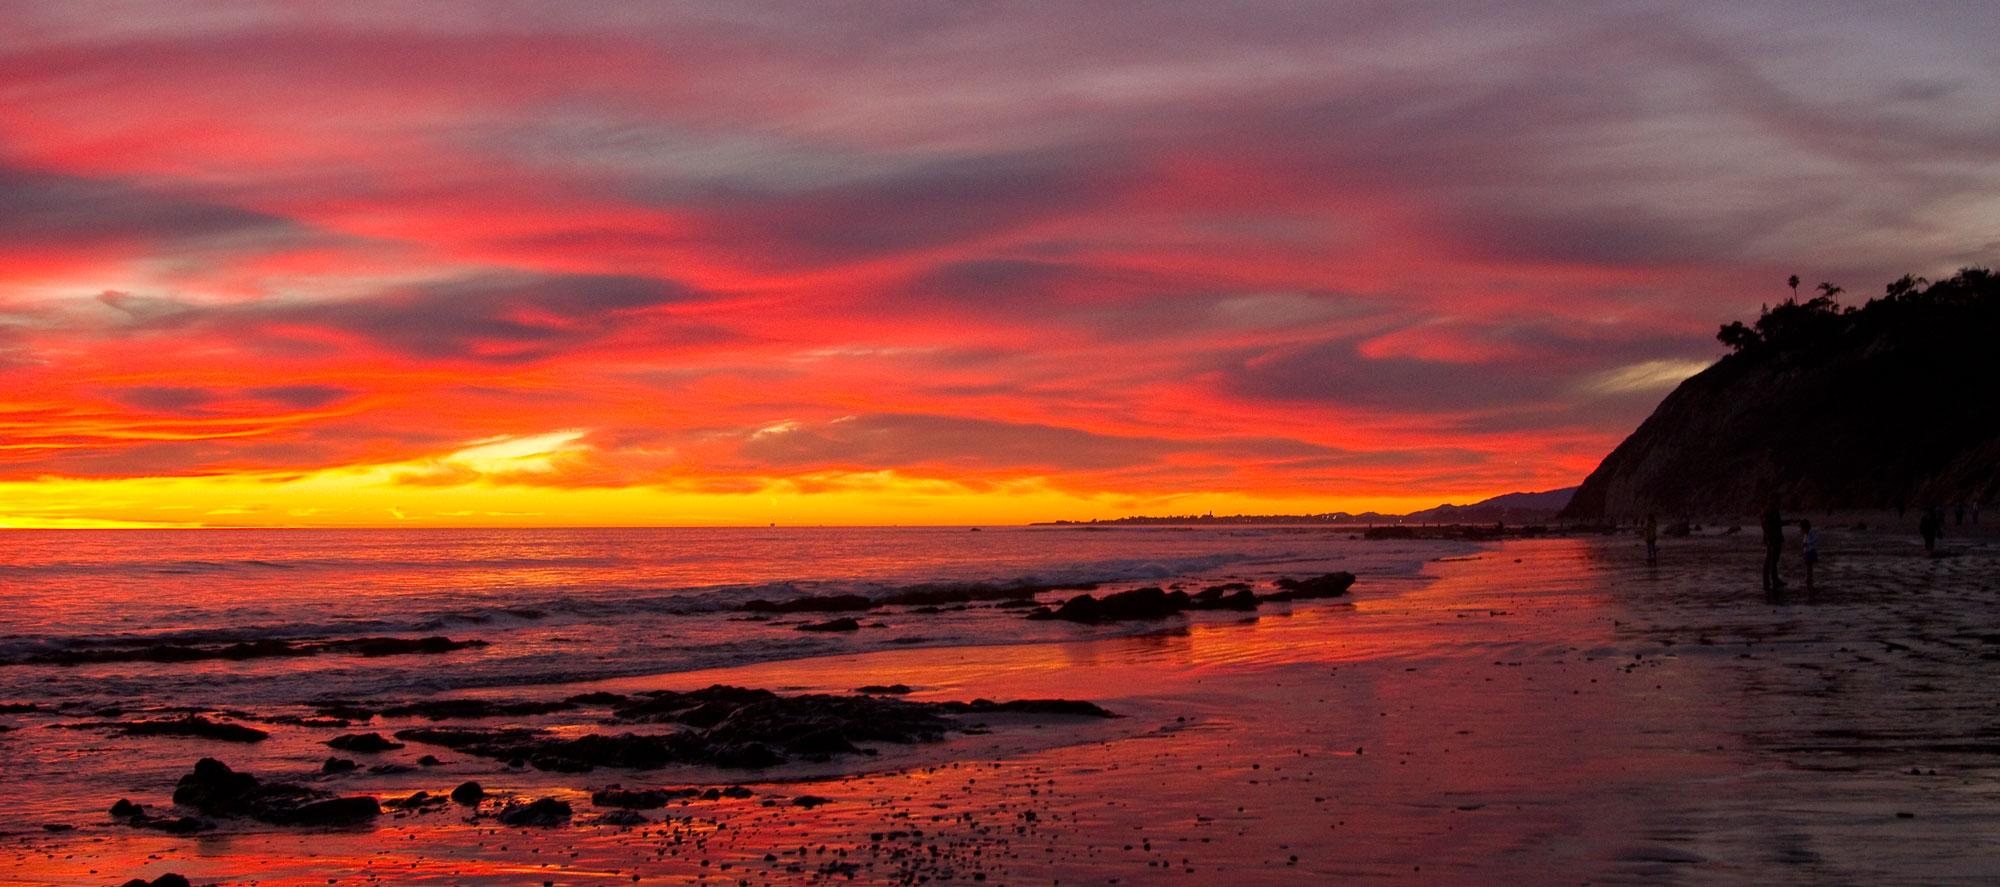 santa barbara california, santa barbara real estate, santa barbara beaches